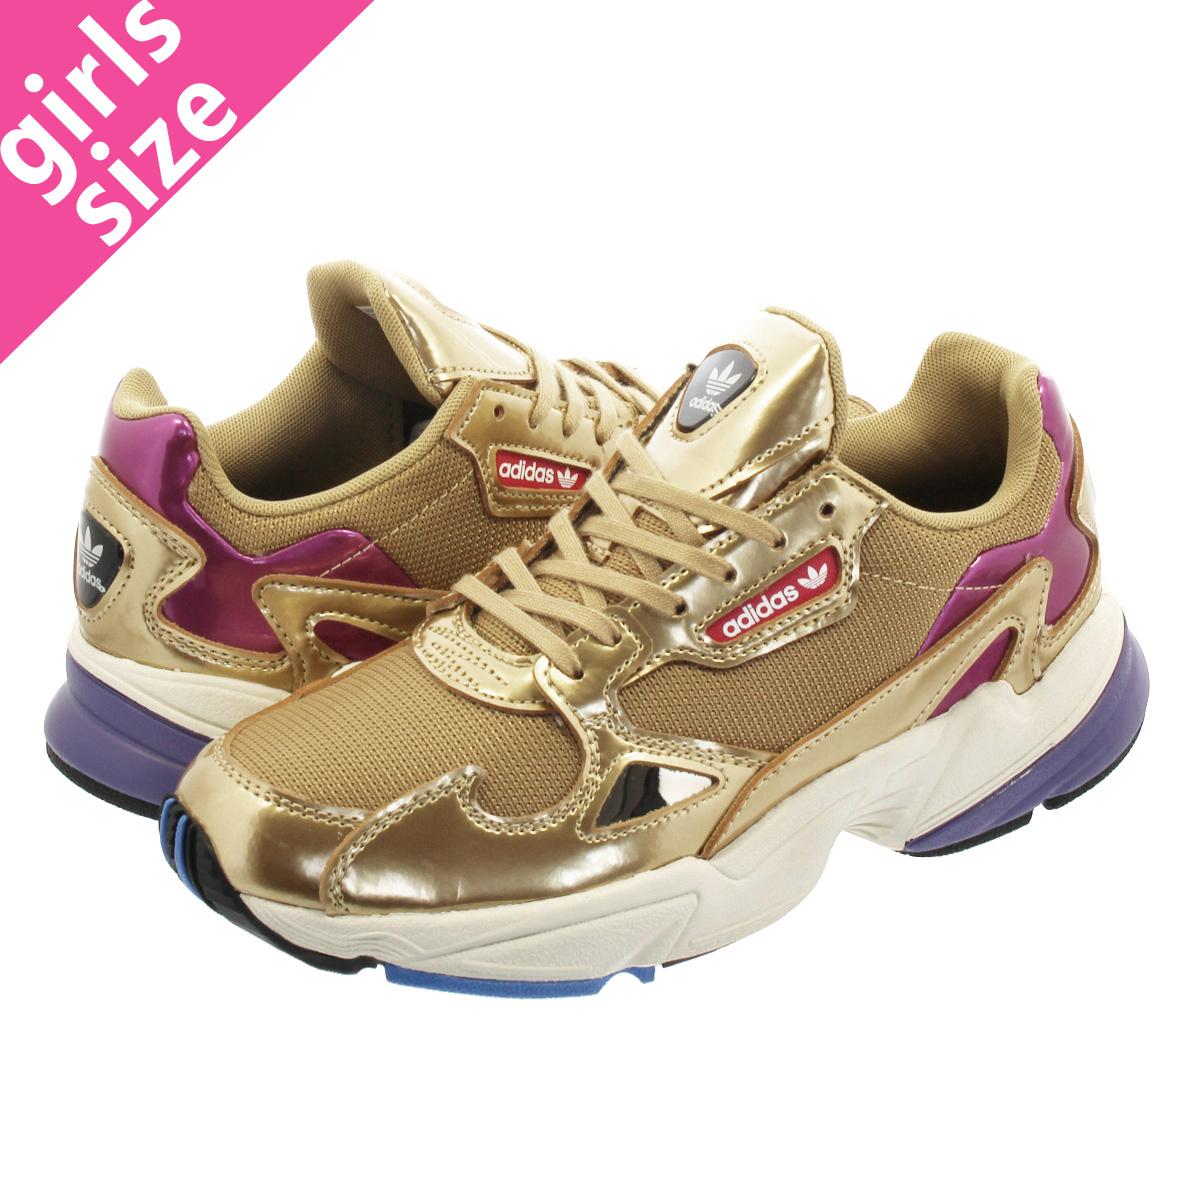 5a73f269fe274 adidas ADIDASFALCON W Adidas Adidas falcon women GOLD MET GOLD MET OFF  WHITE cg6247